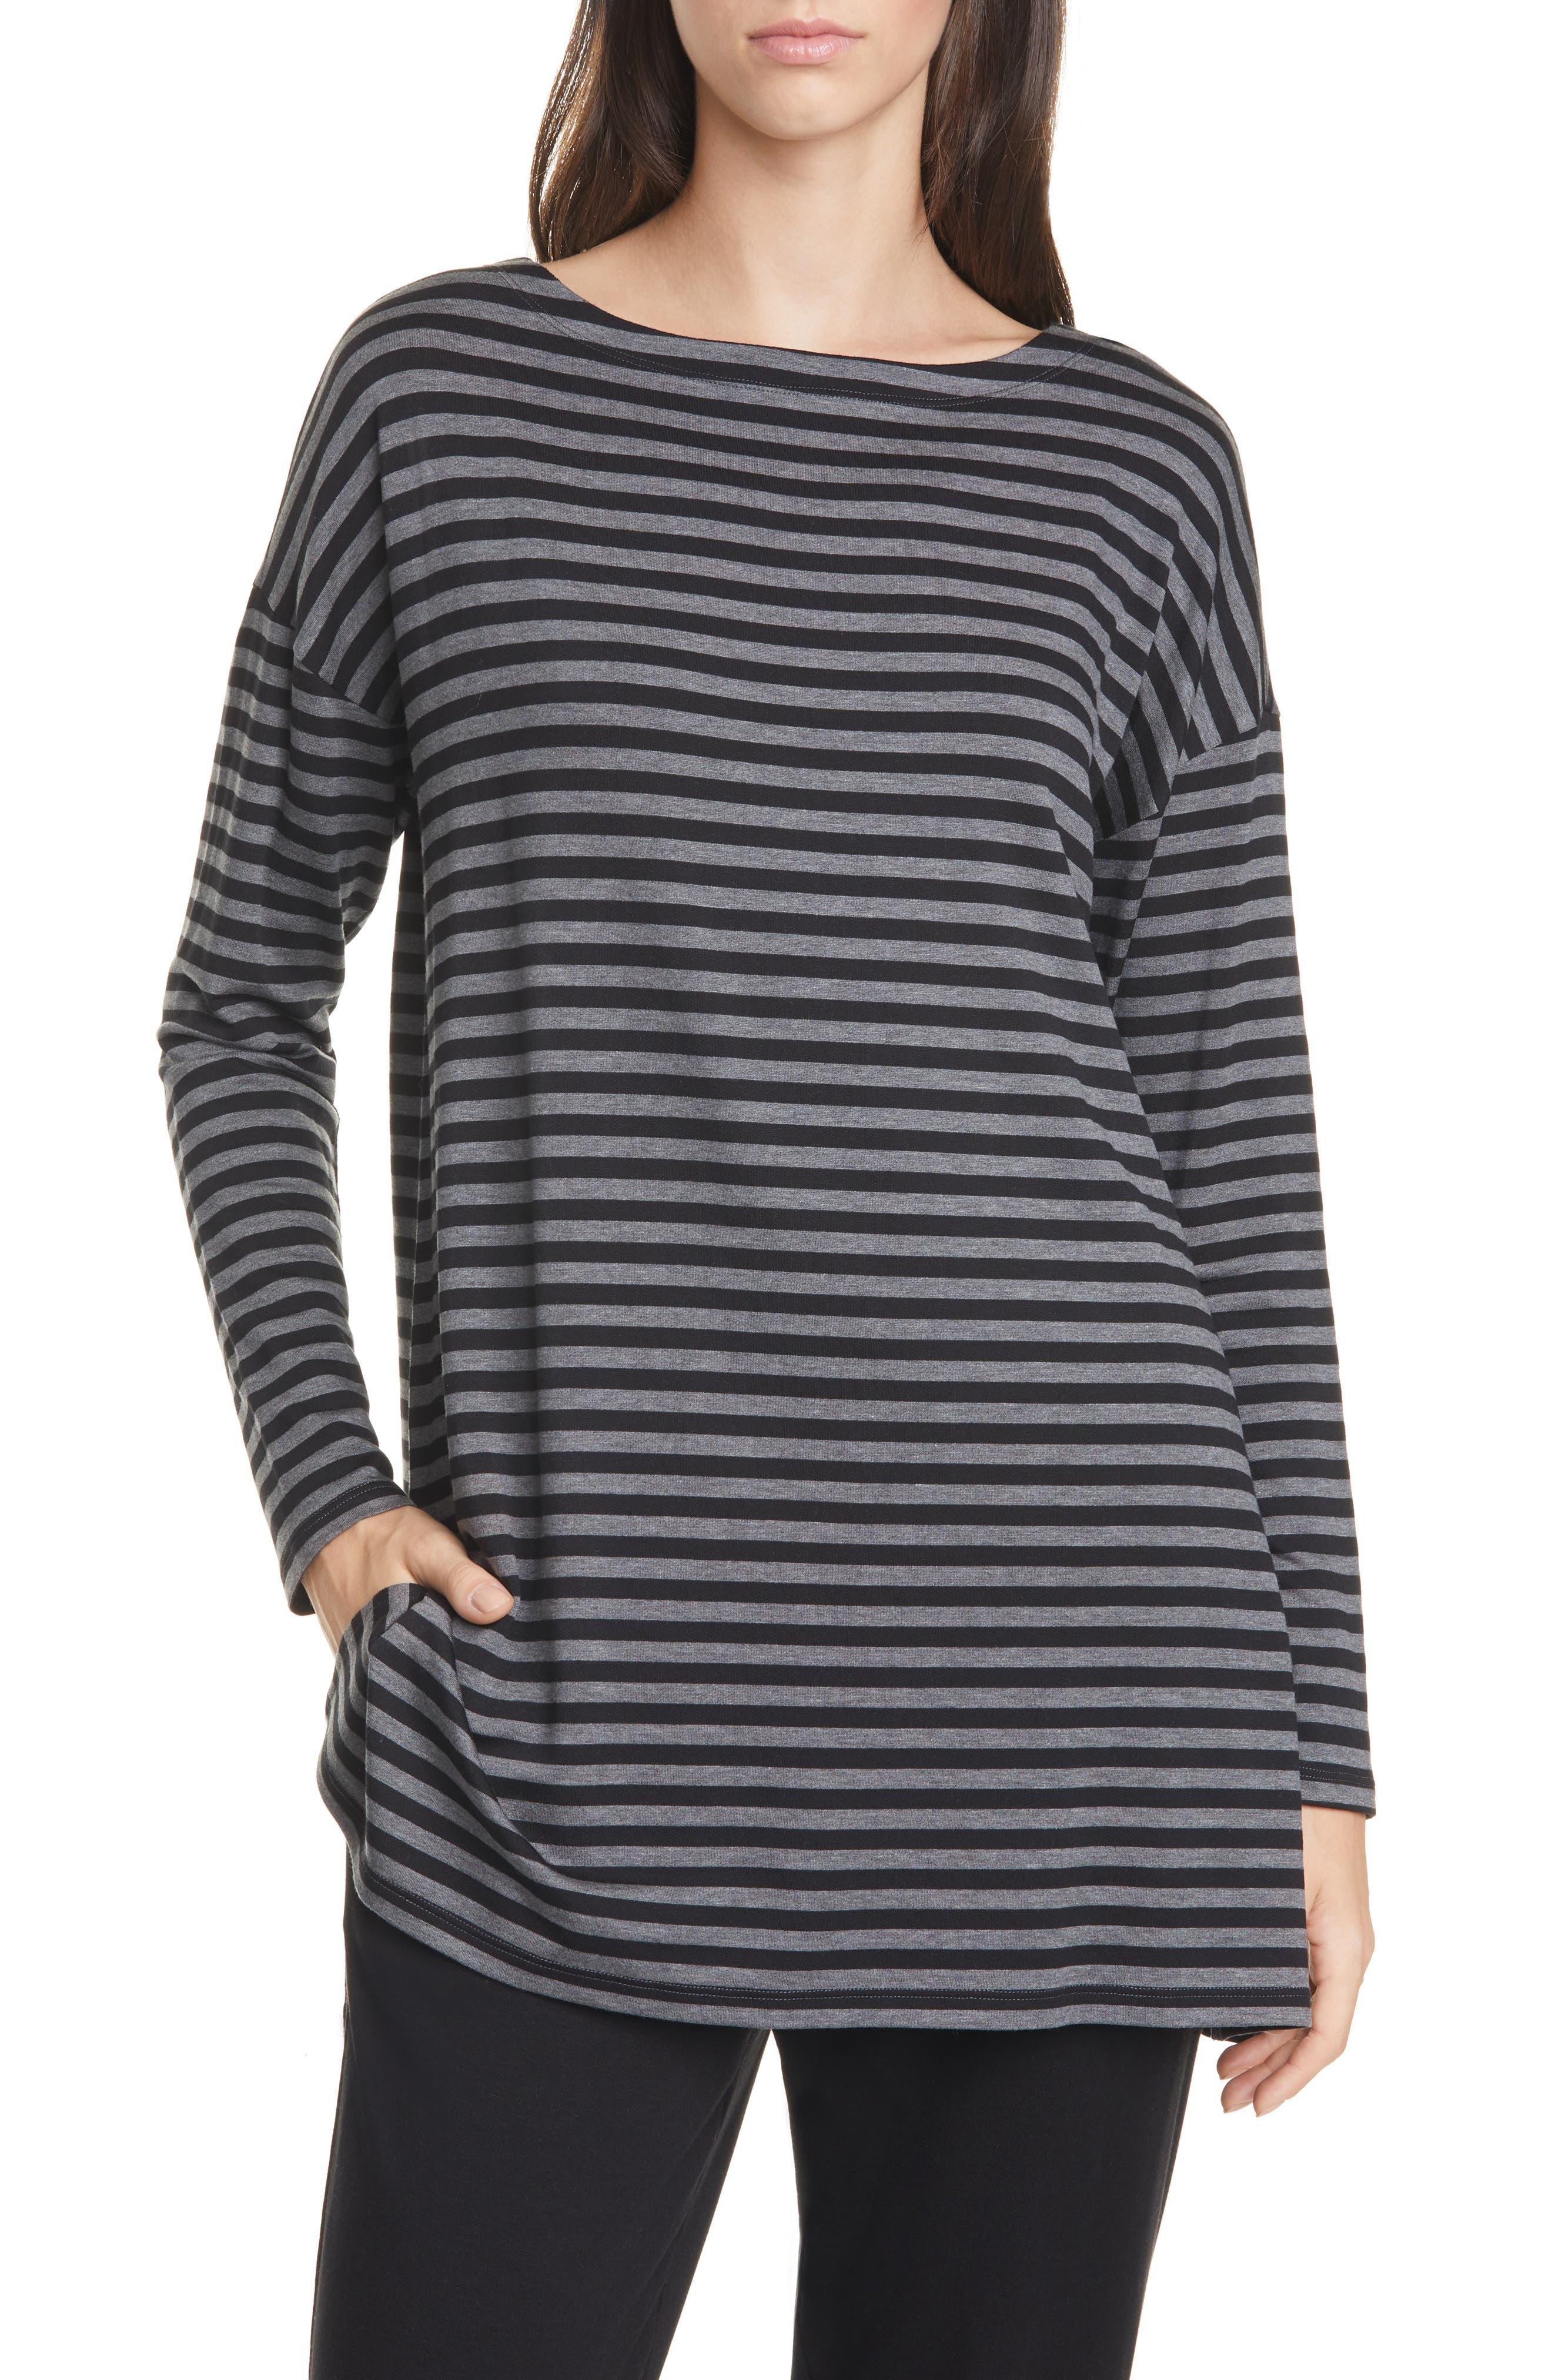 Eileen Fisher Tops Bateau Neck Stripe Top